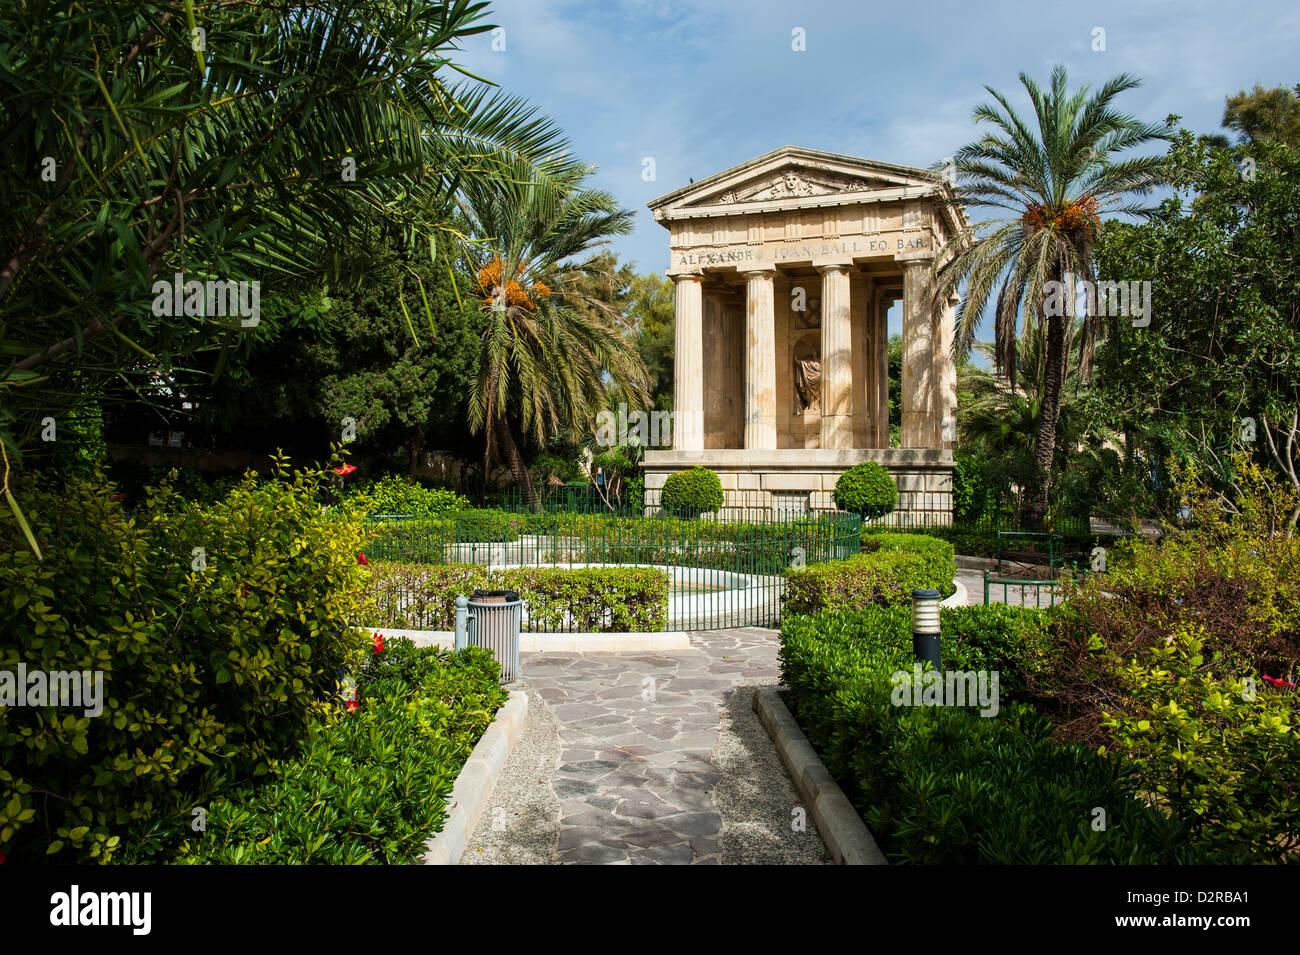 Lower Barrakka Gardens and the Alexander Ball memorial temple, Valetta, UNESCO World Heritage Site, Malta, Europe - Stock Image